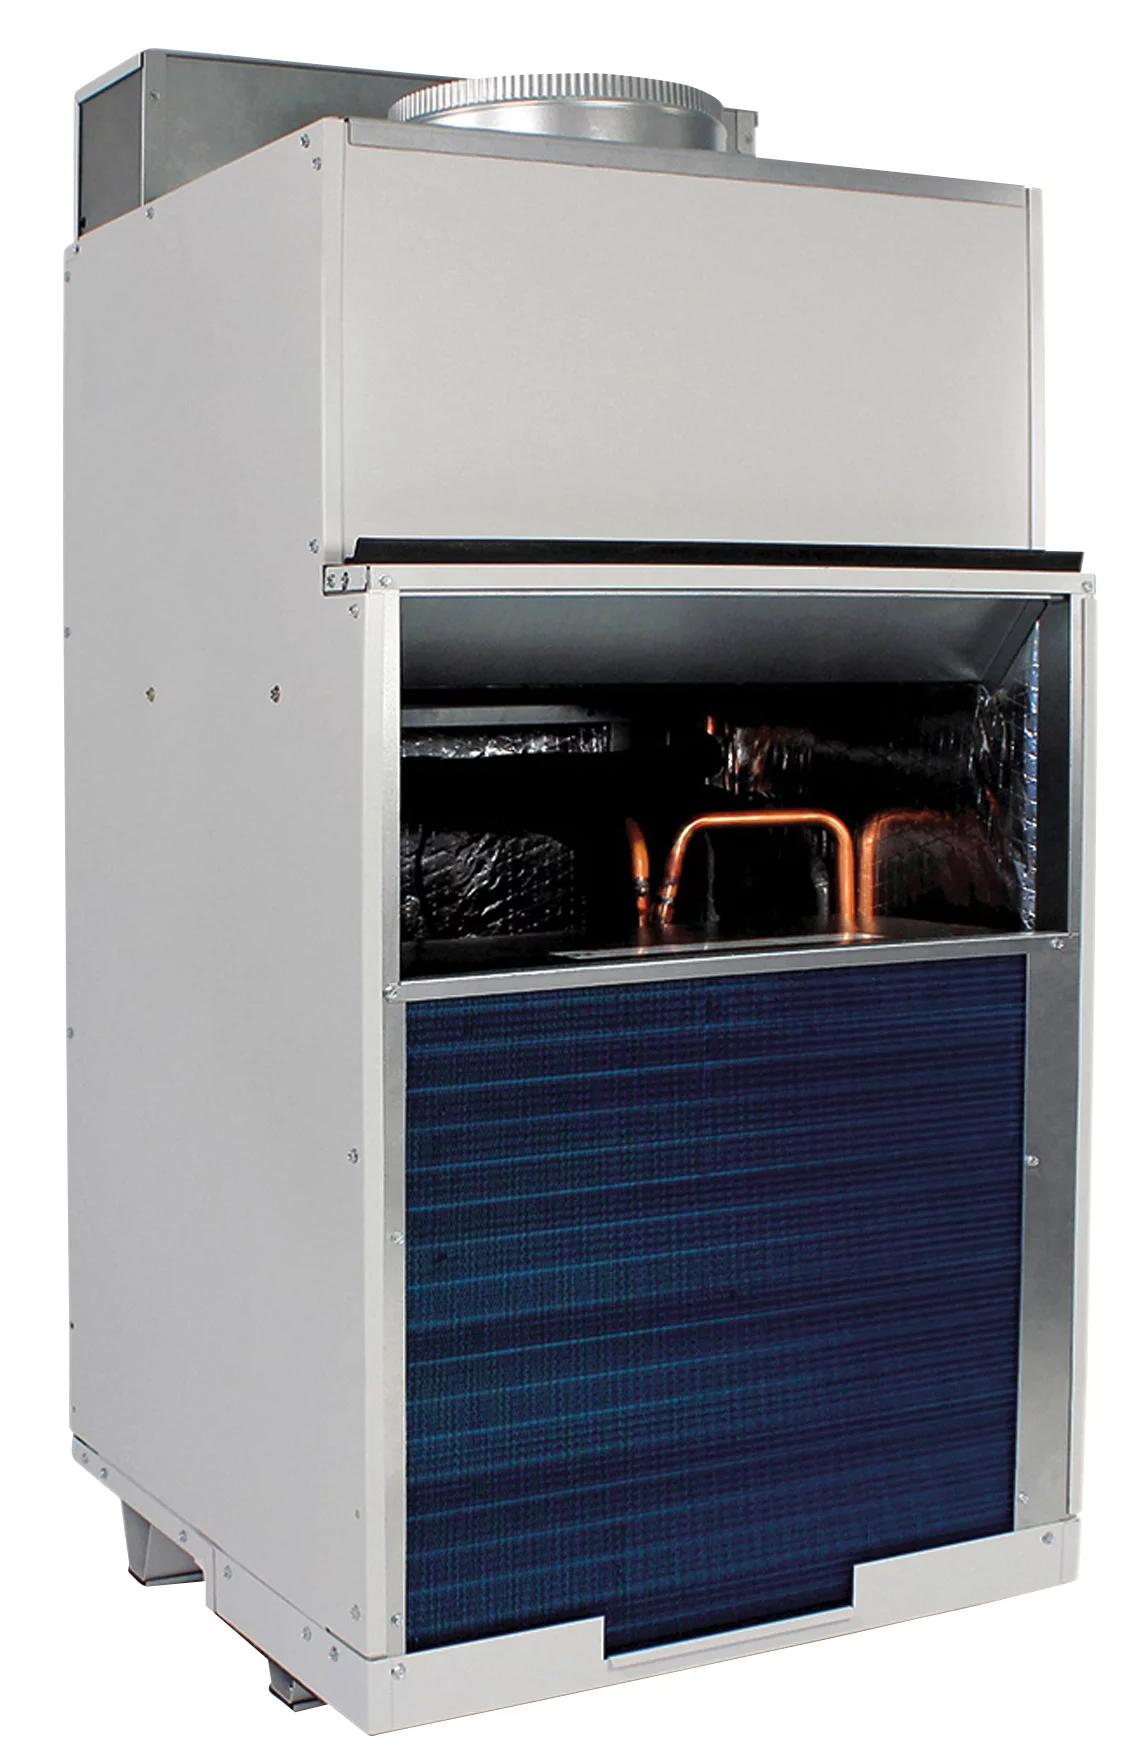 Amana AVH183H25AXXX 18000 BTU Vertical Terminal Air Conditioner with Heat Pump (VTAC) - 15 Amp